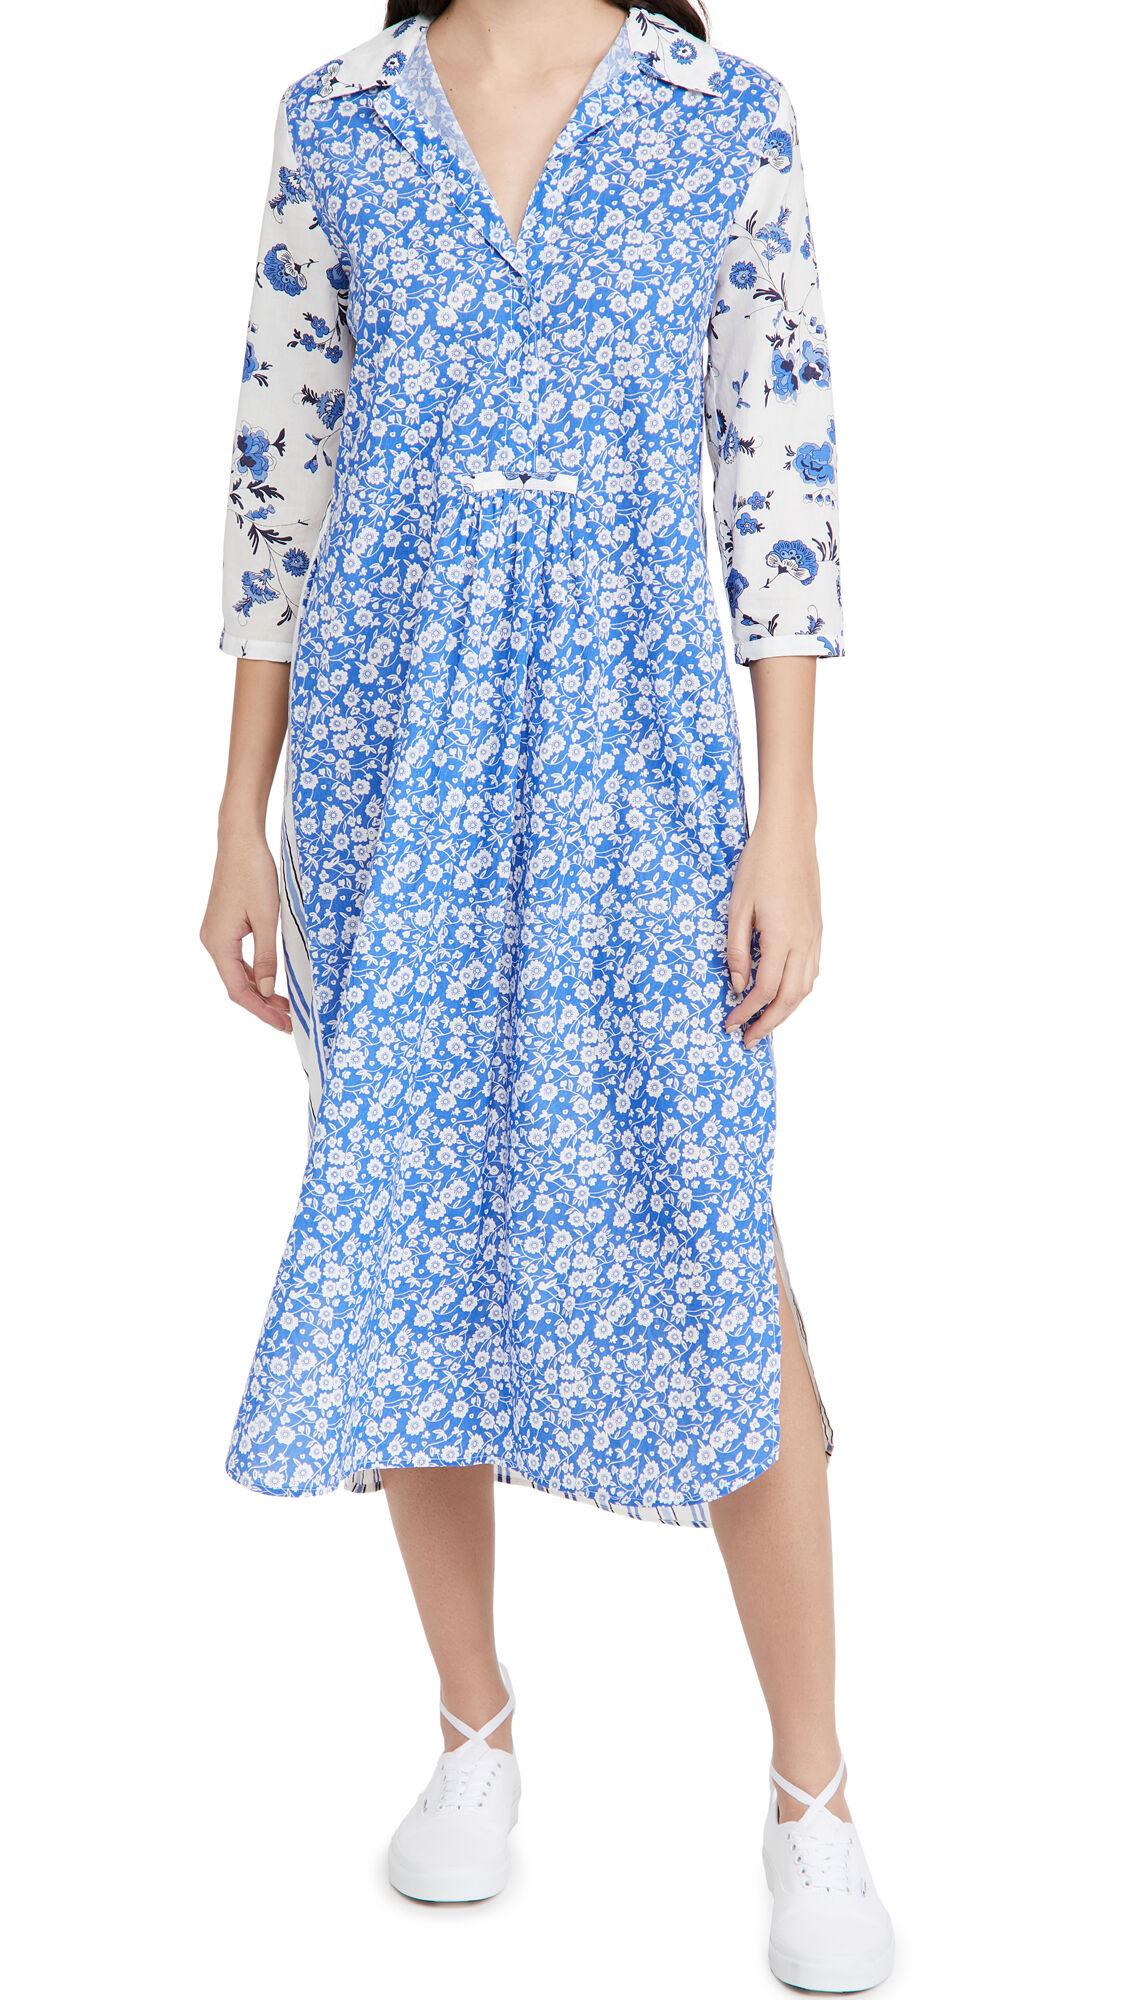 Ro's Garden Brooklyn Dress  - Provence Blue - Size: Small